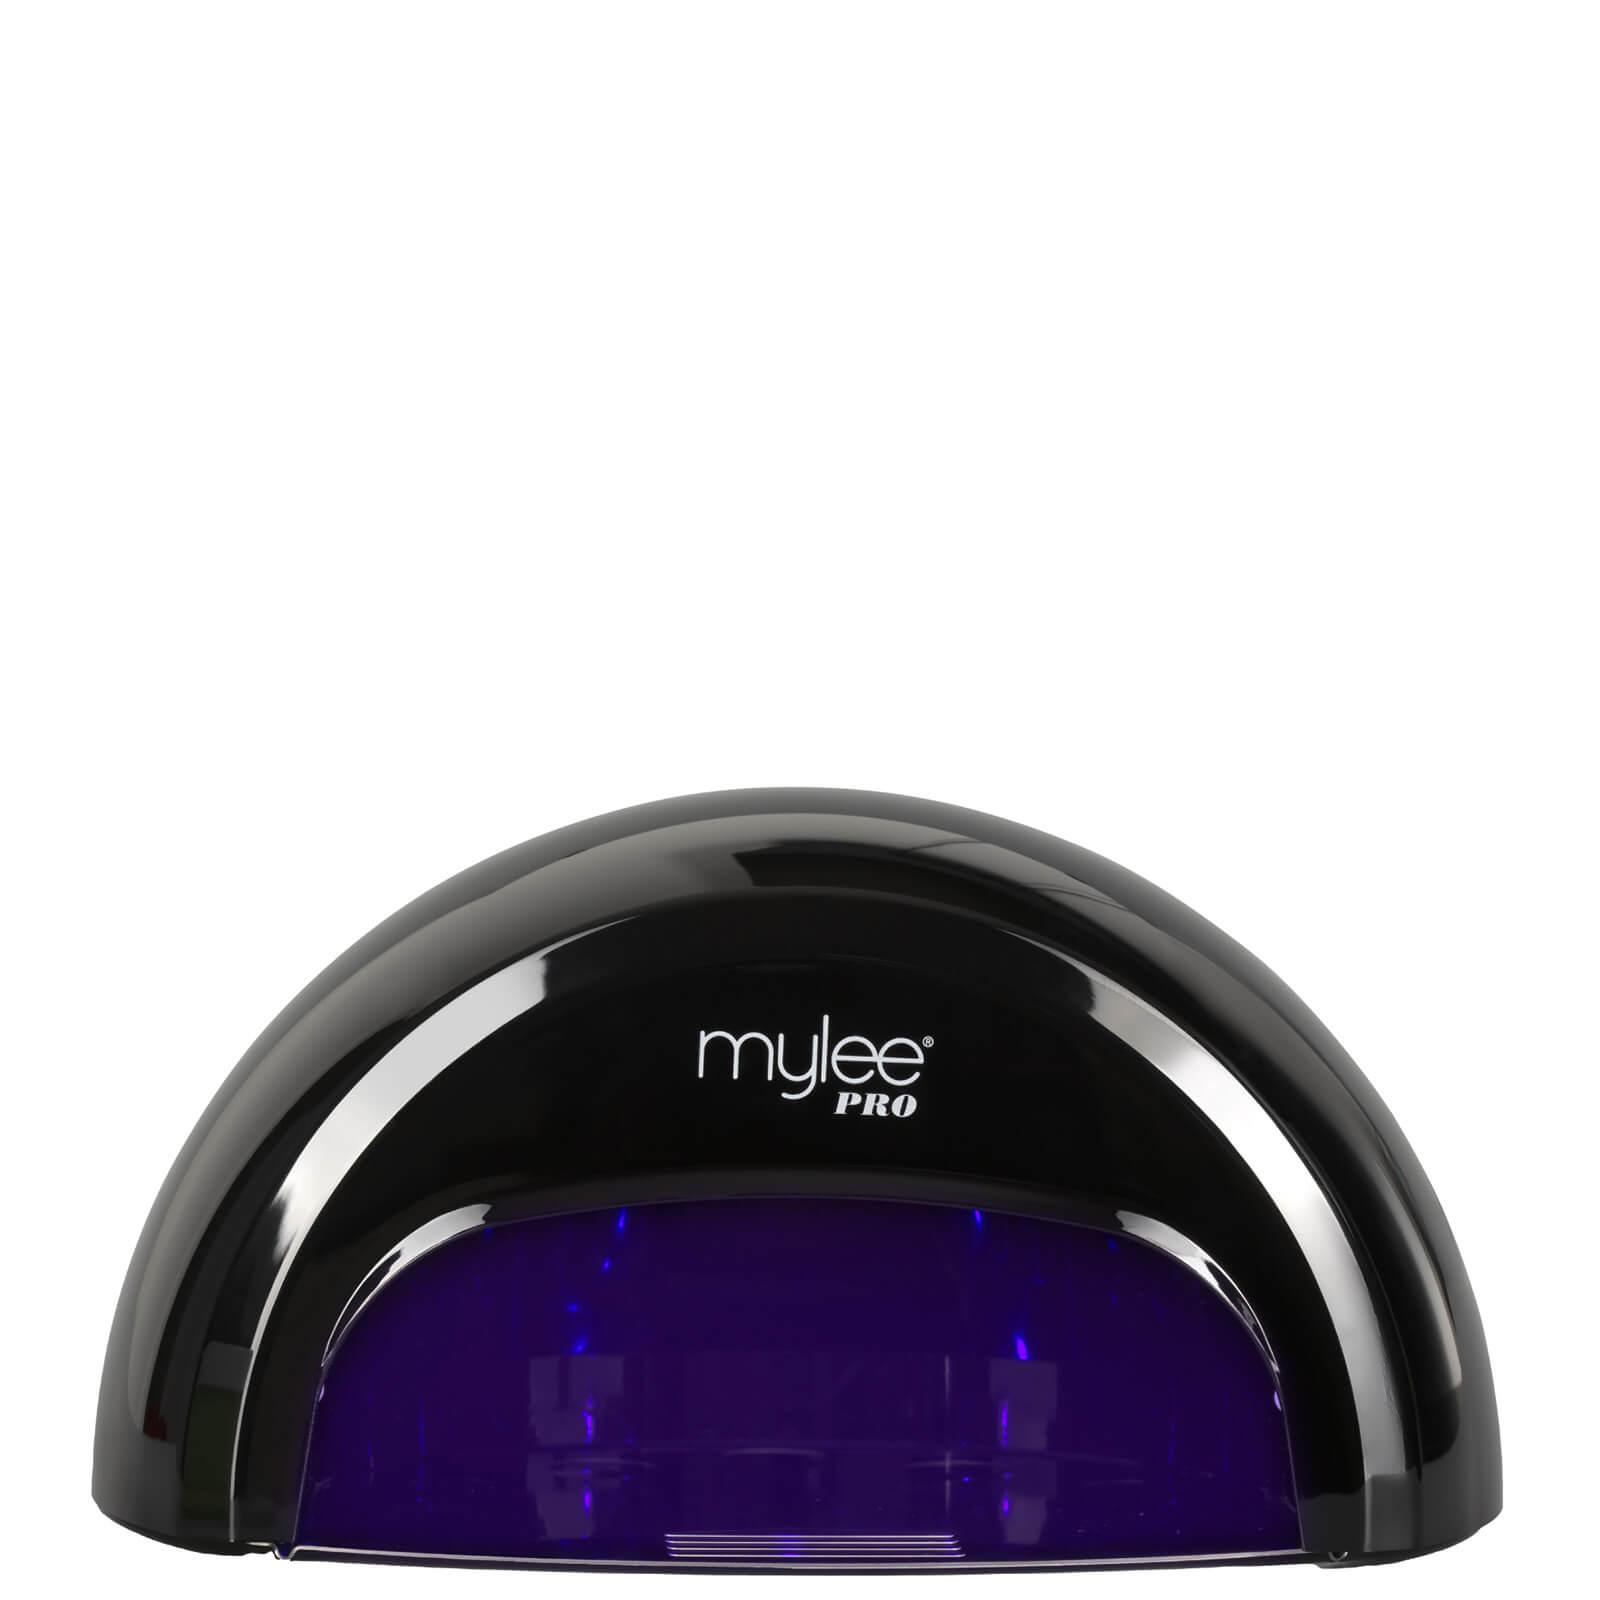 Купить Mylee Pro Salon Series LED Lamp Convex - Black